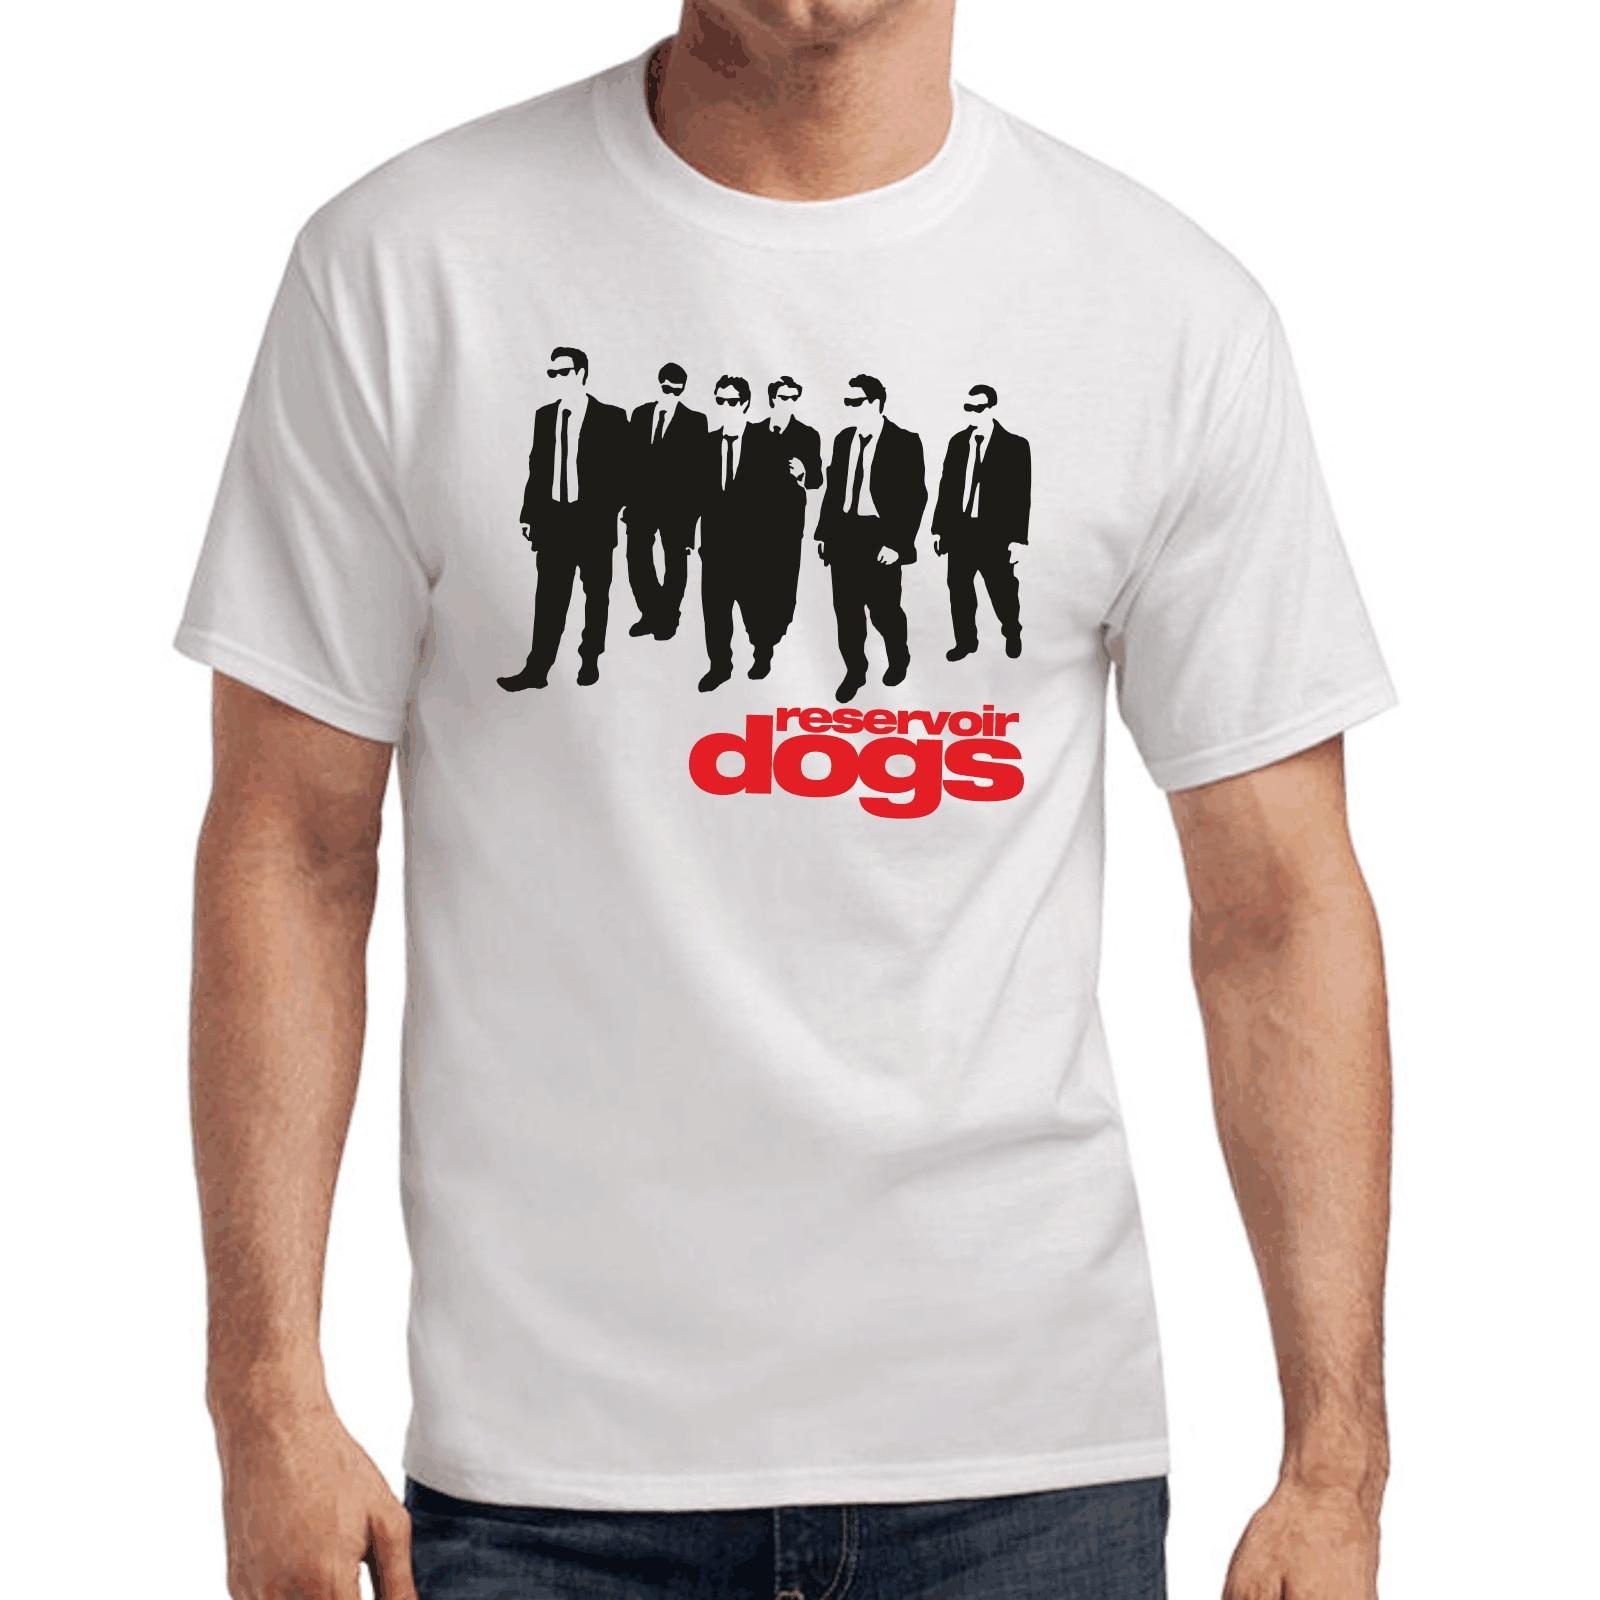 reservoir-dogs-quentin-font-b-tarantino-b-font--kult-movie-retro-s-3xl-t-shirt-fashion-print-t-shirt-plus-size-selling